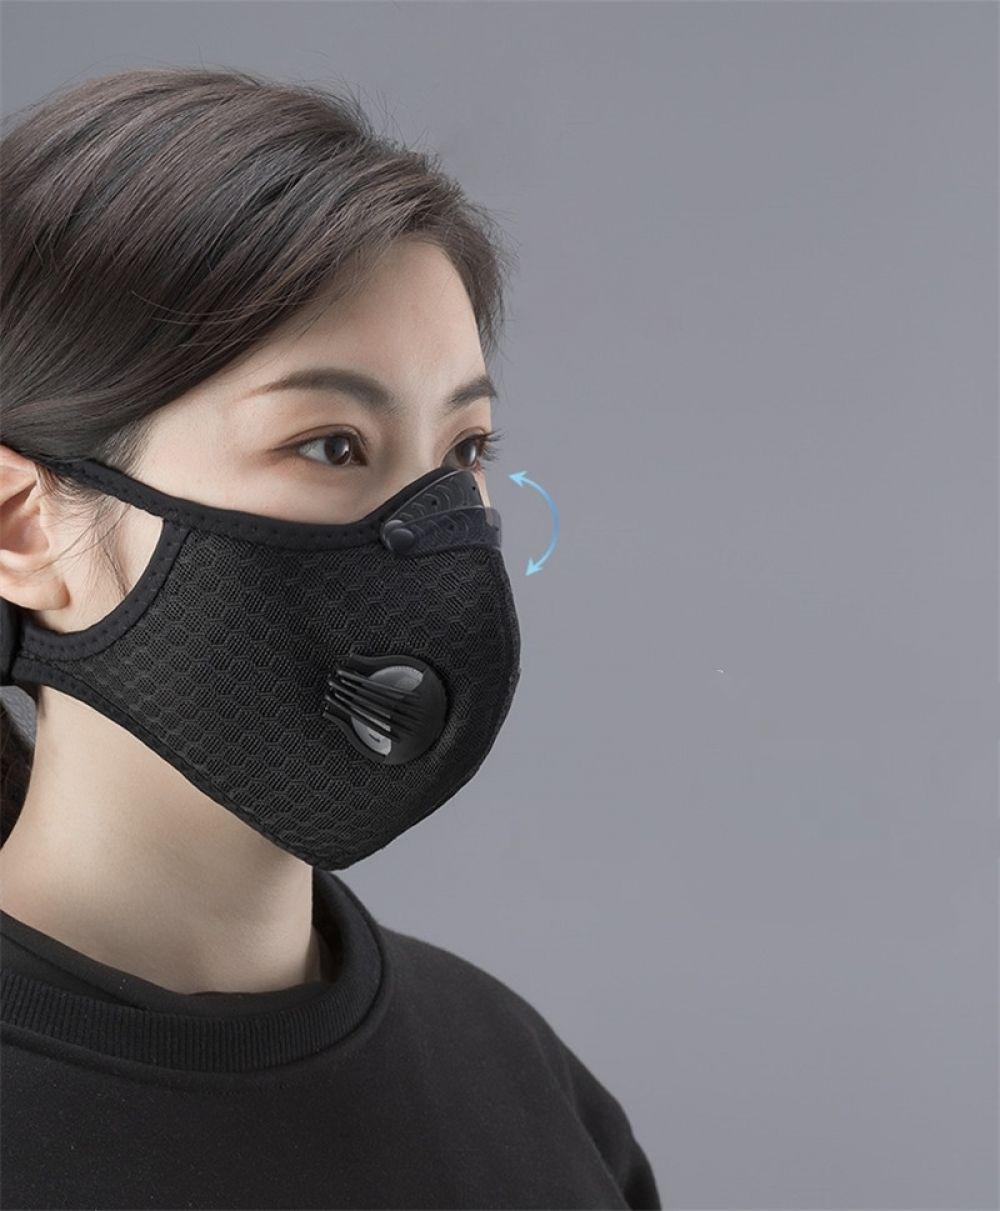 Pin on respirator mask gallery